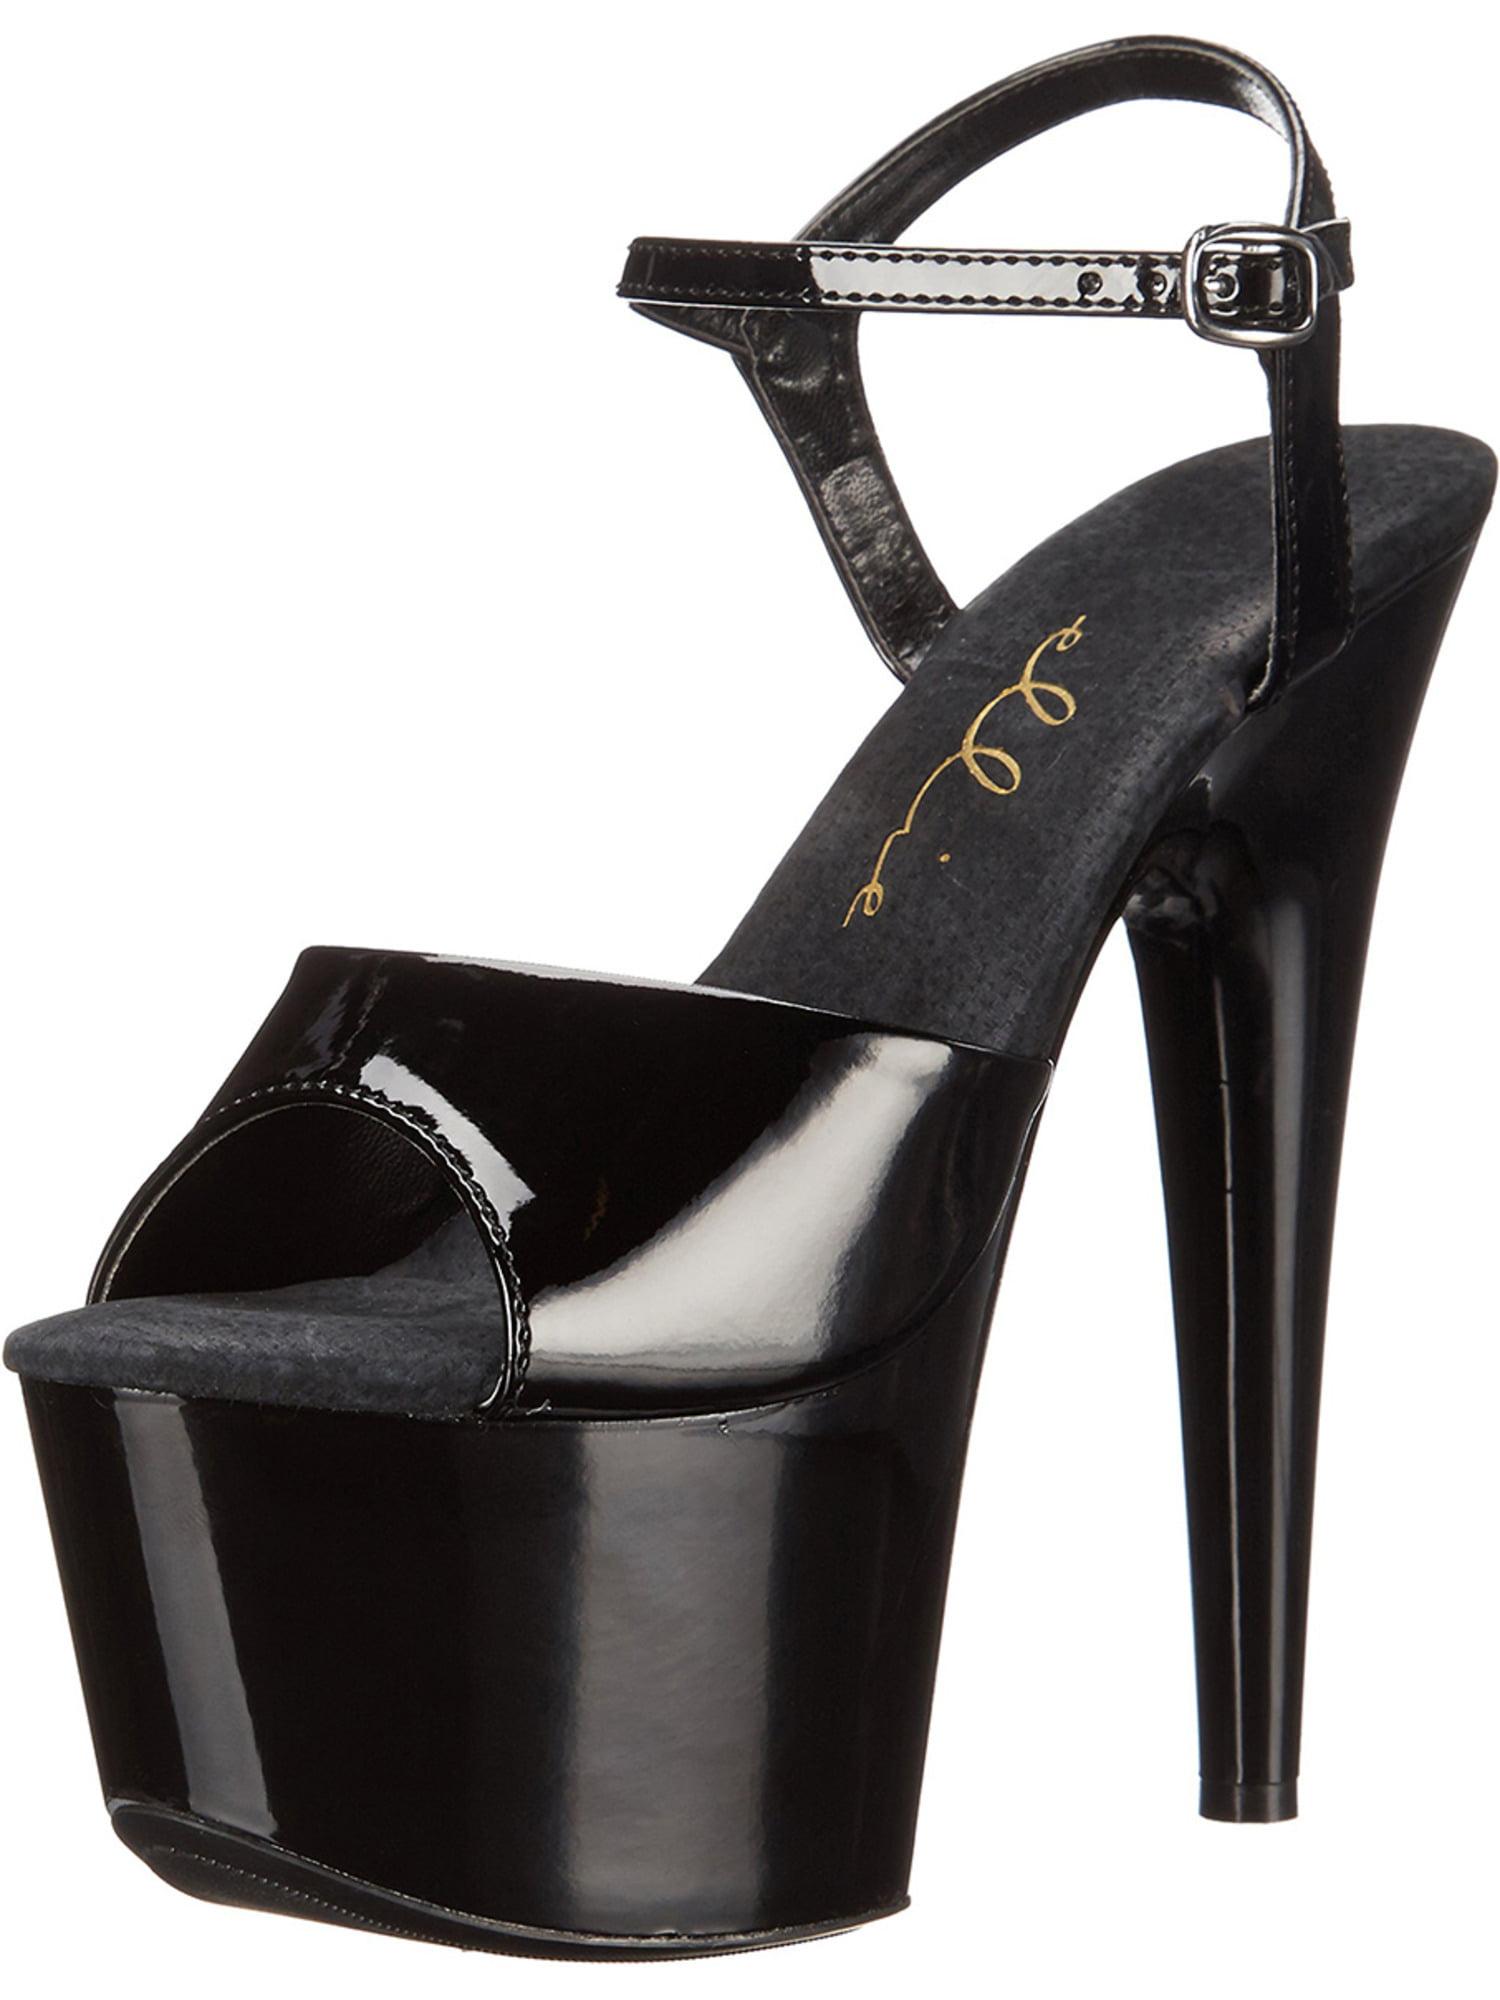 7 Inch Women's High Heel Shoes Sexy